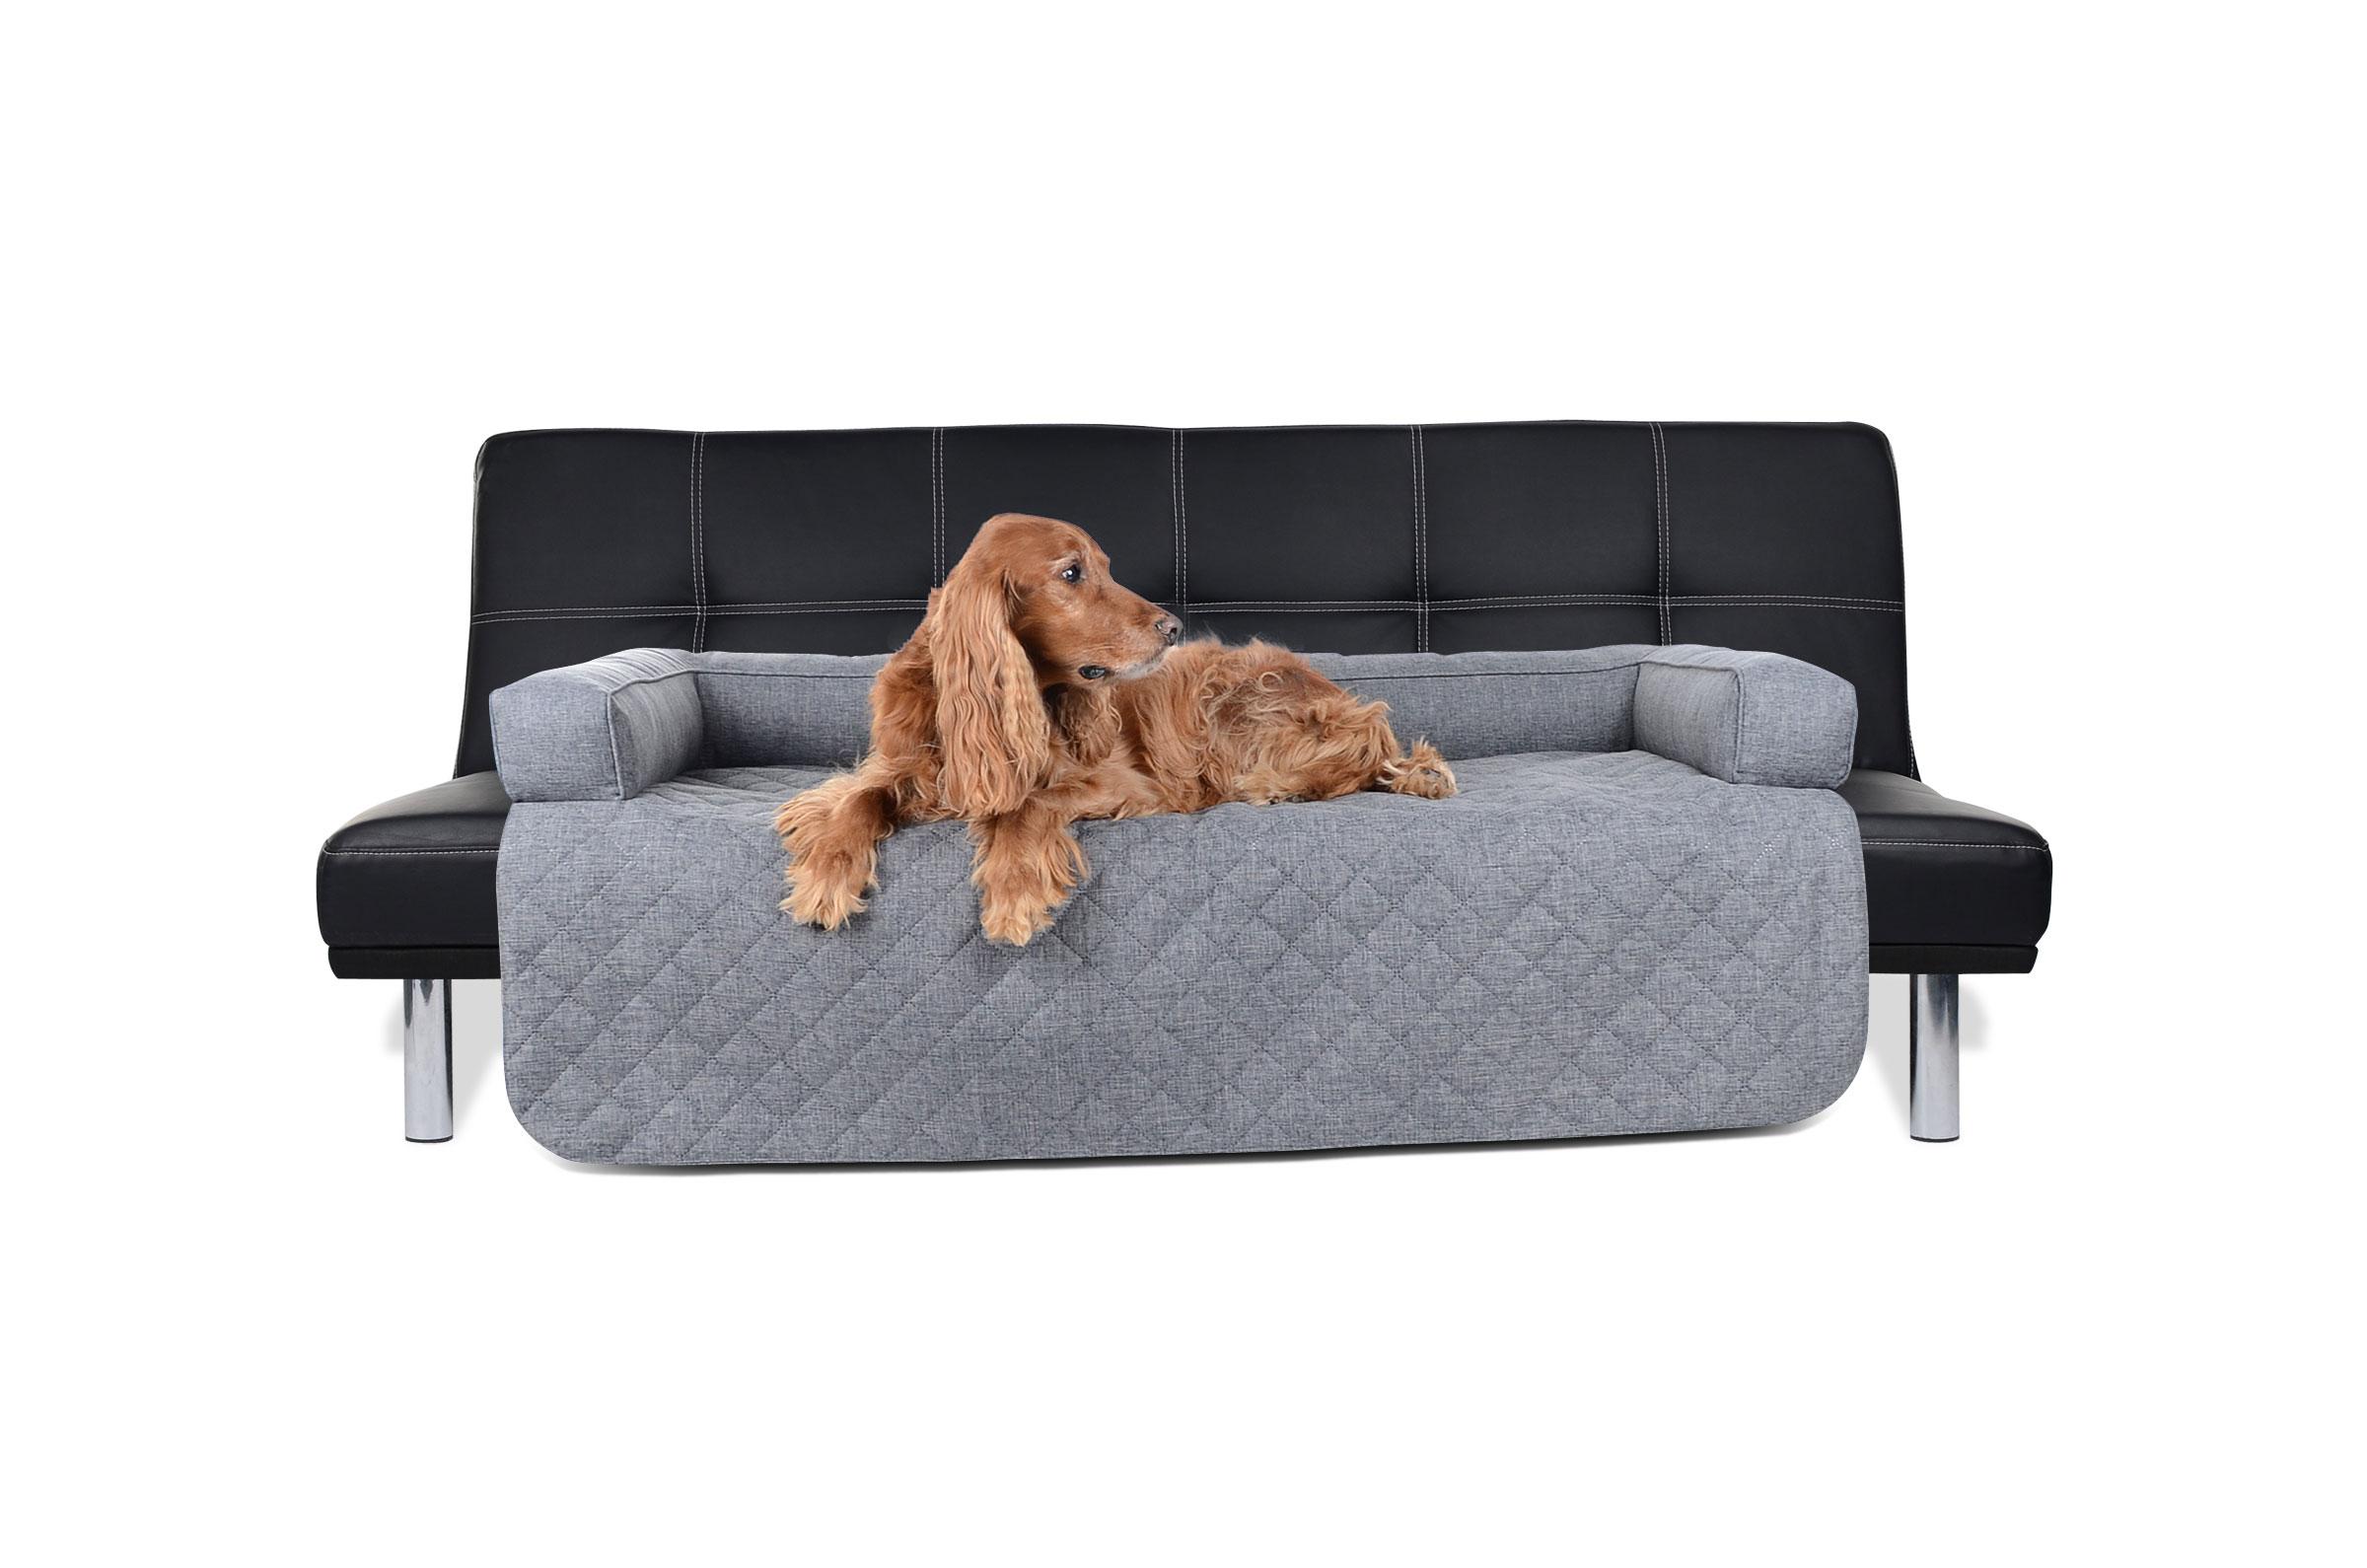 Full Size of Hunde Sofaschutzdecke Hay Mags Sofa 3er Grau Mit Relaxfunktion 3 Sitzer Höffner Big Alternatives Xxl Rolf Benz Mondo 2 Büffelleder Dreisitzer Lila Sofa überwurf Sofa